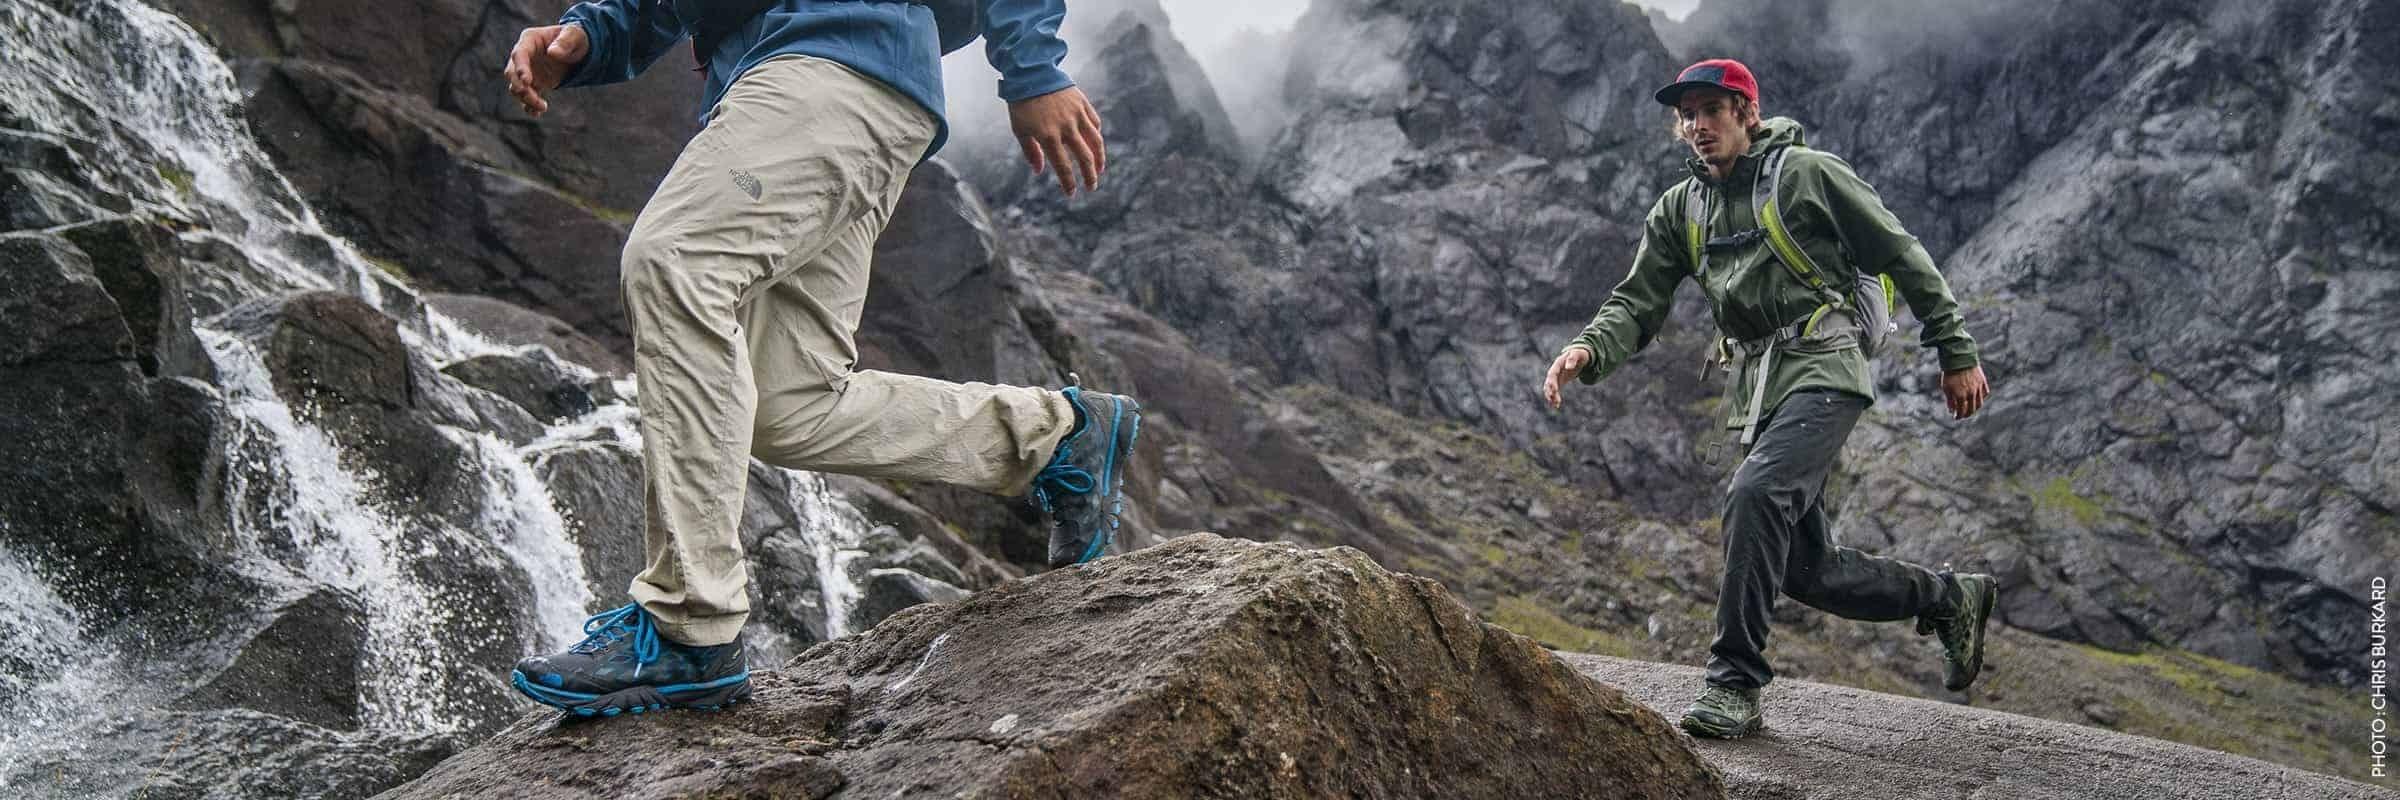 Choosing the right hiking footwear